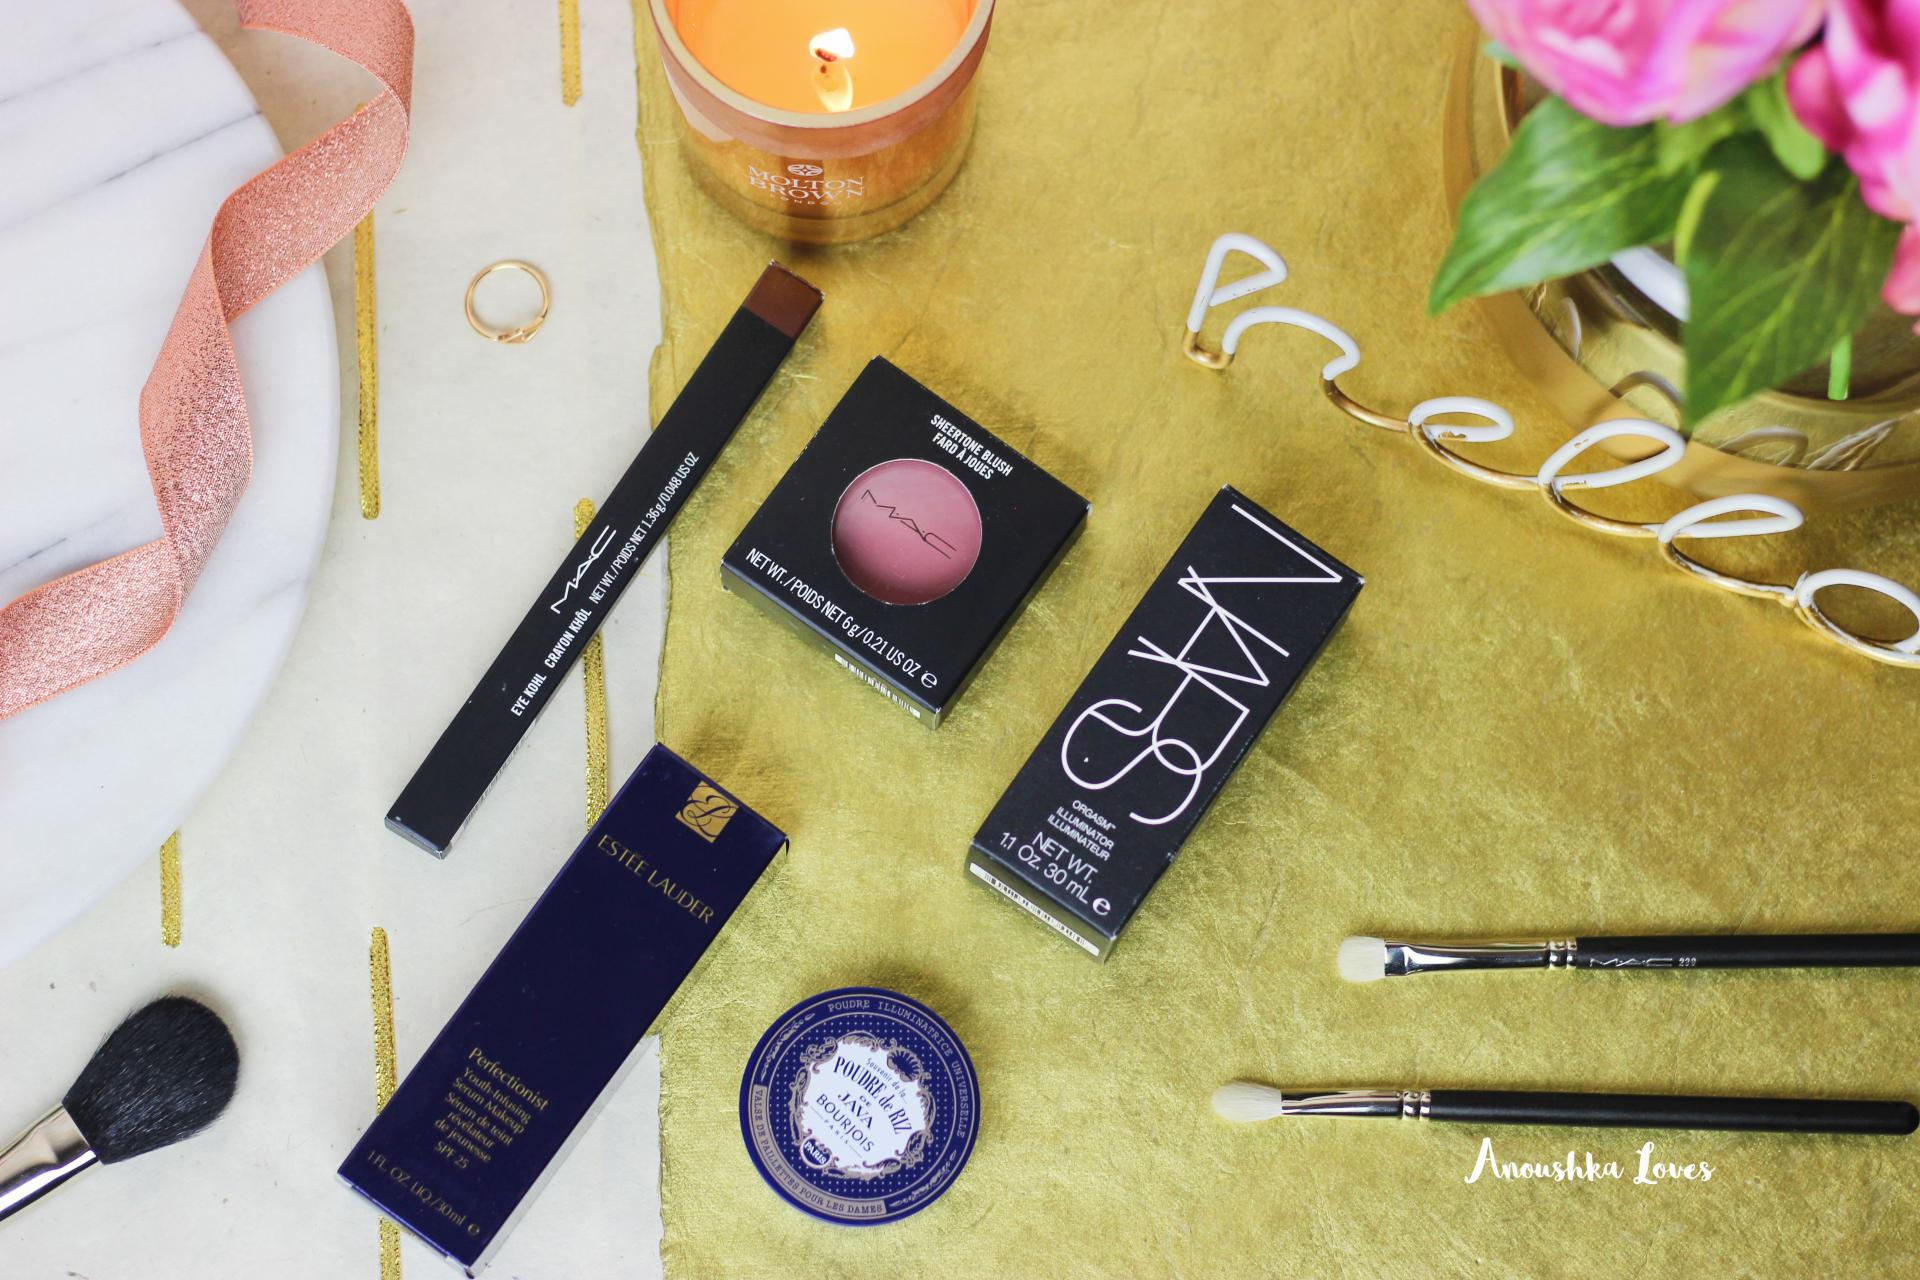 Fragrance Direct Does Makeup!